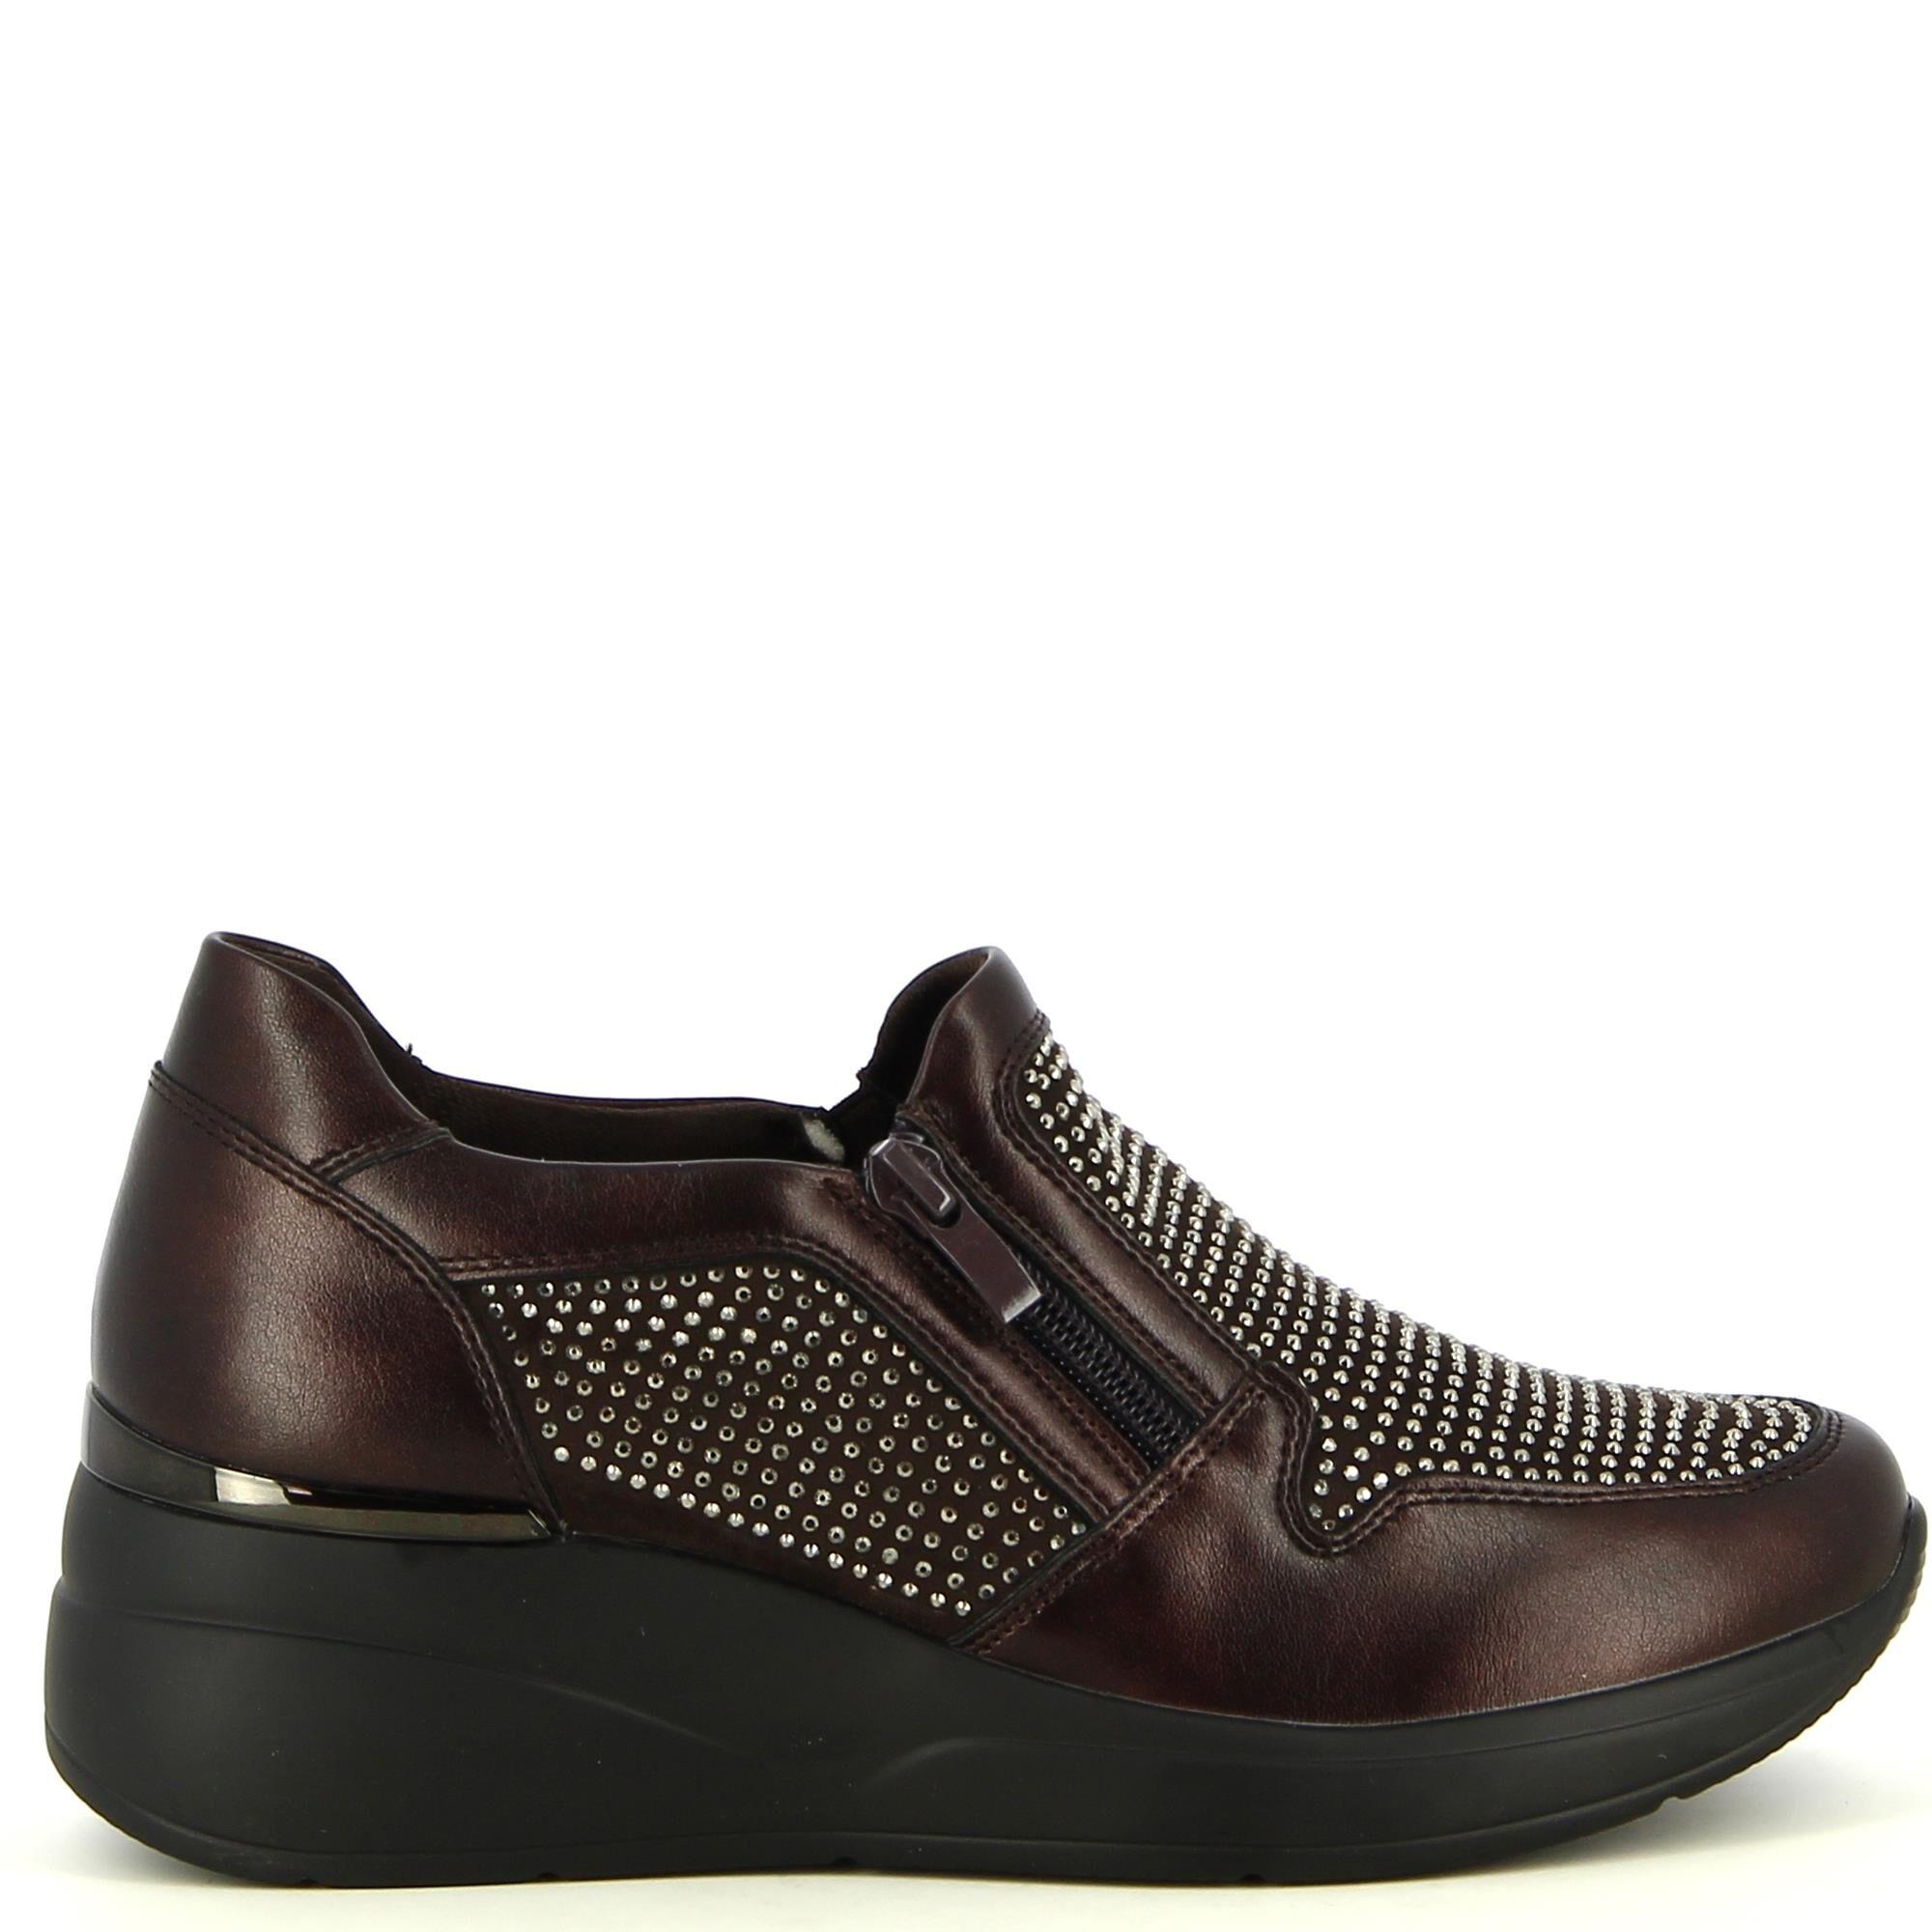 Ken Shoe Fashion - Bordeaux - Sneakers